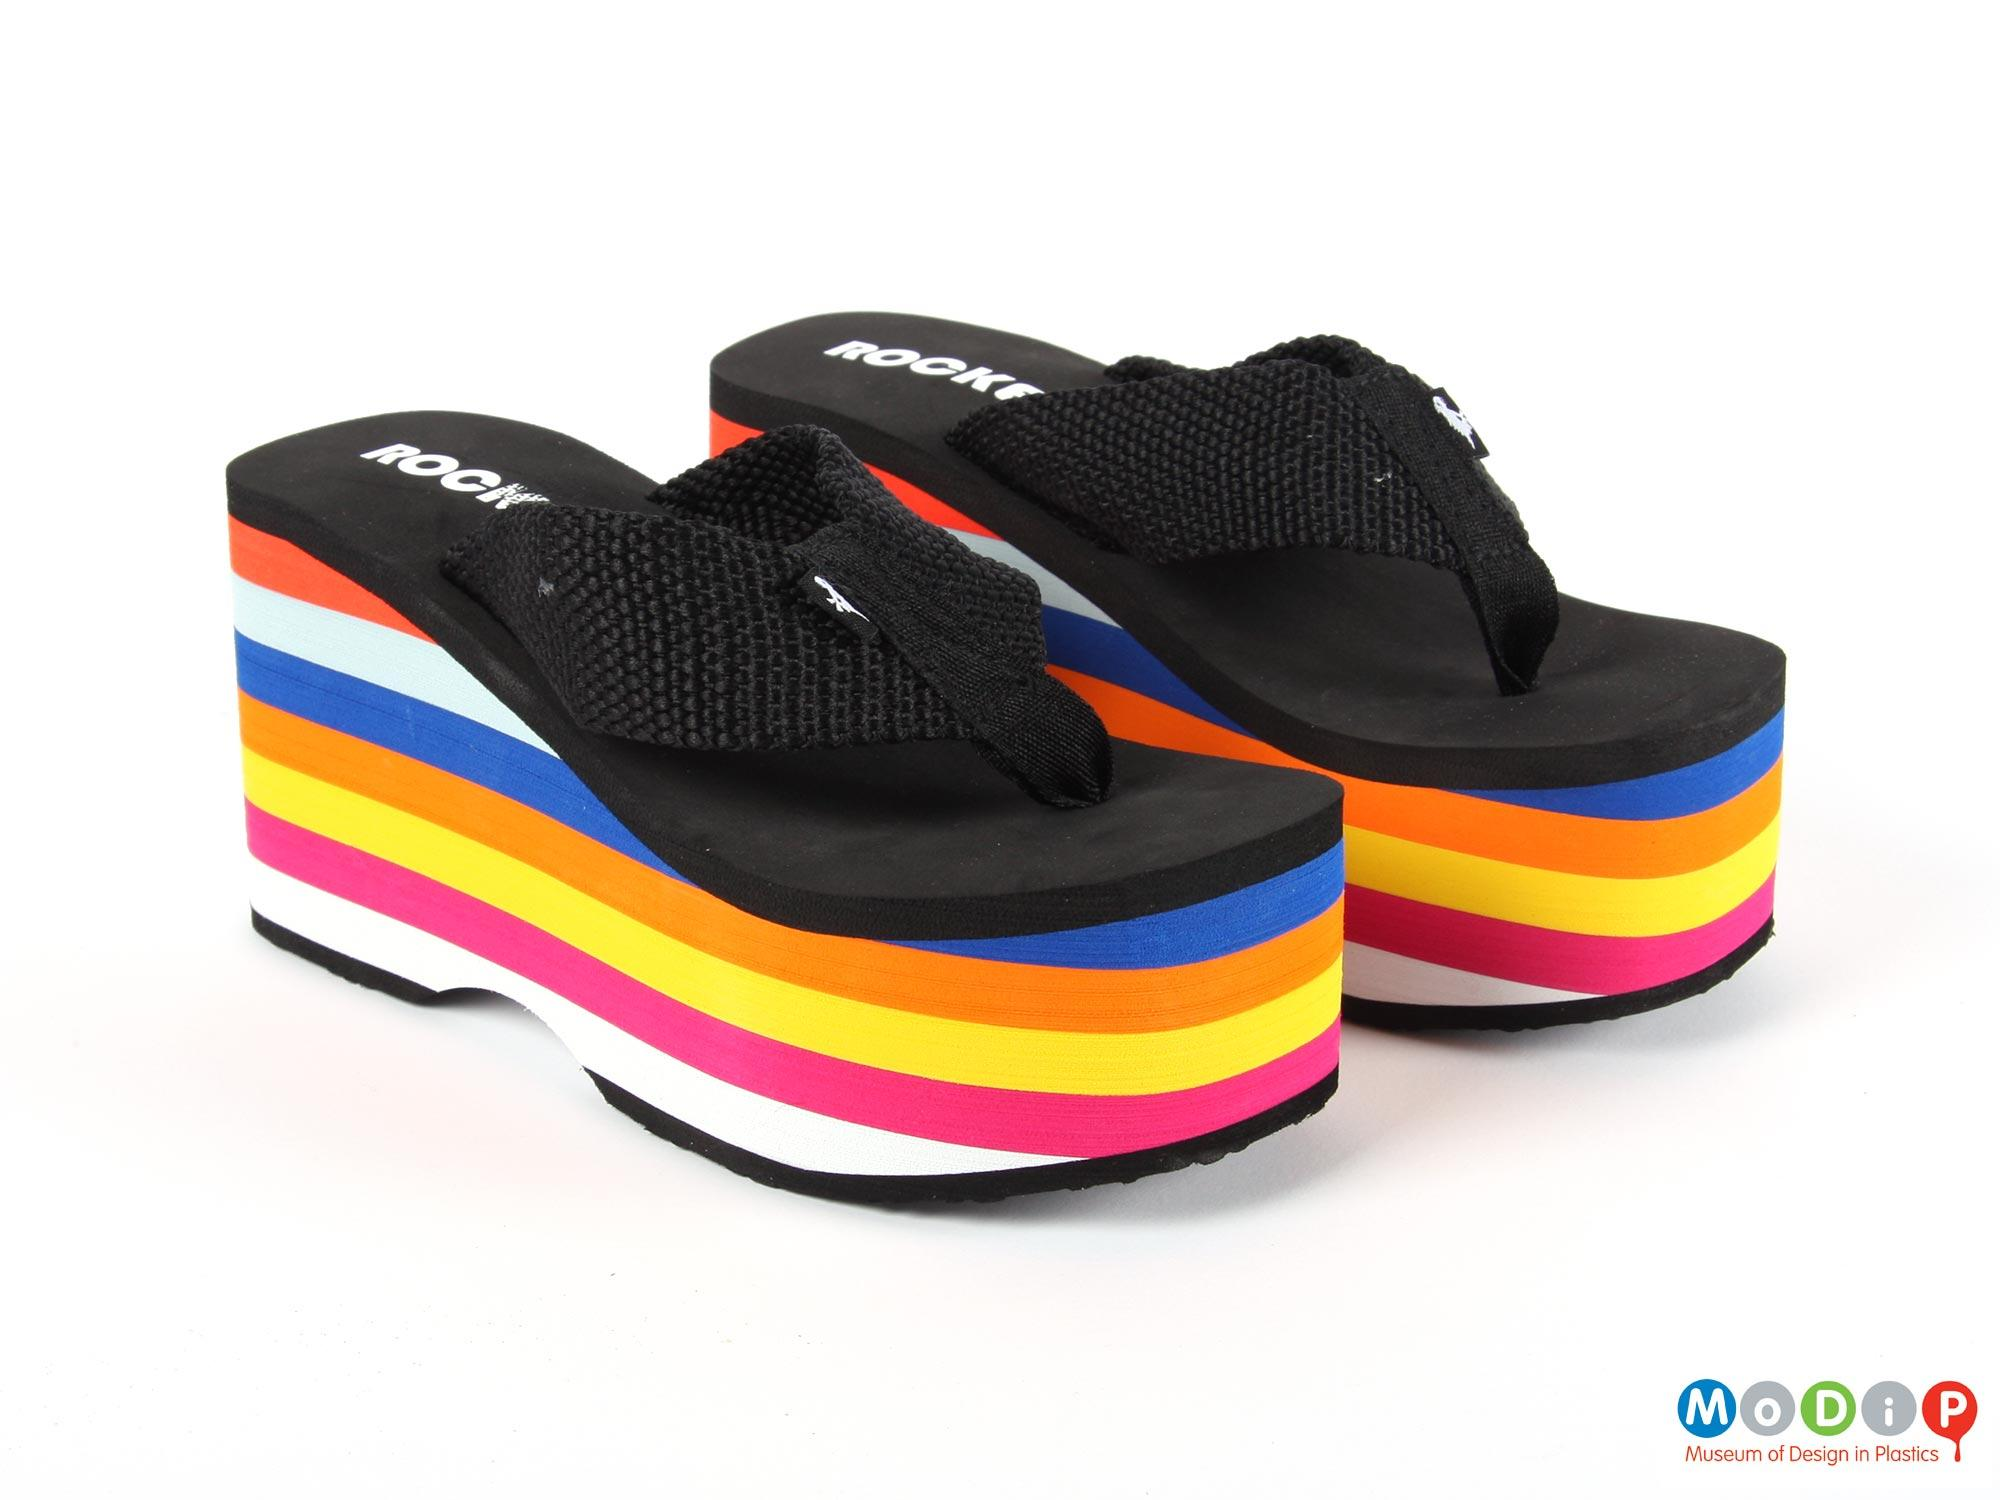 Nike Ultra Celso Thong Flip Flops Red Nike Sandals & Flip